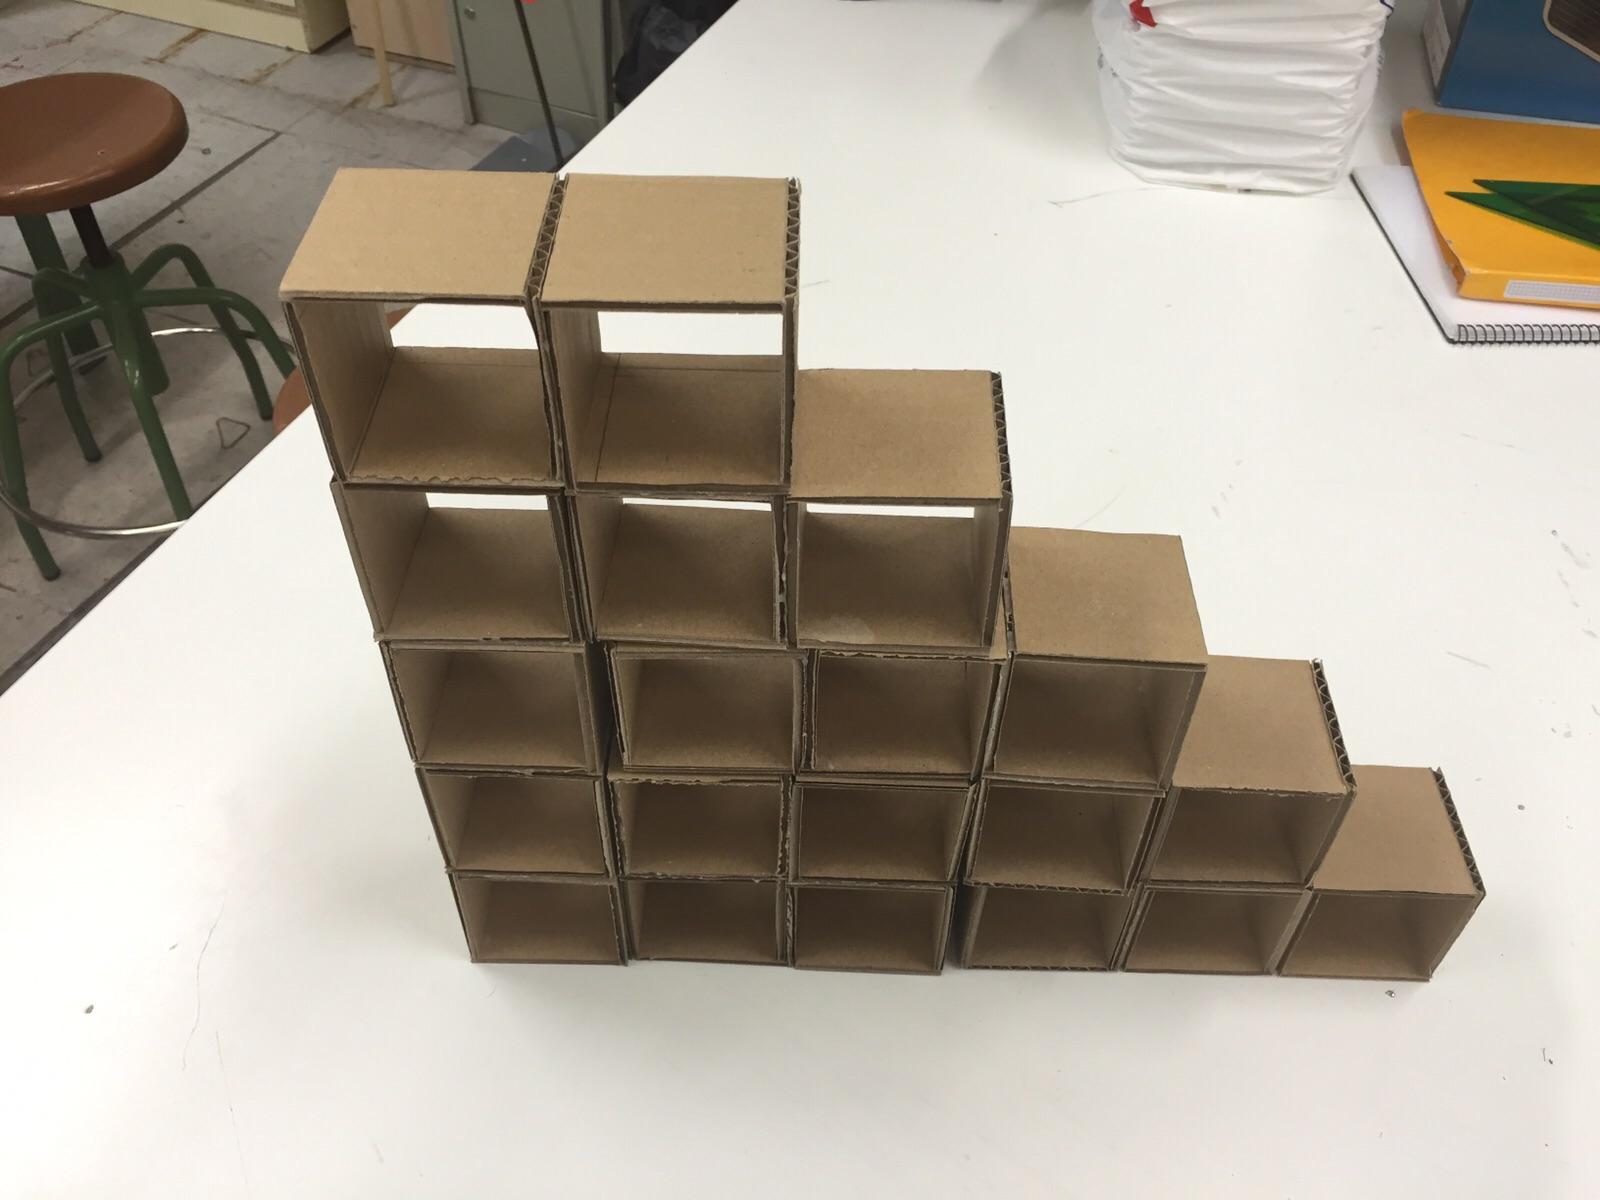 Ale Tecno : Proyecto estantería de cartón.